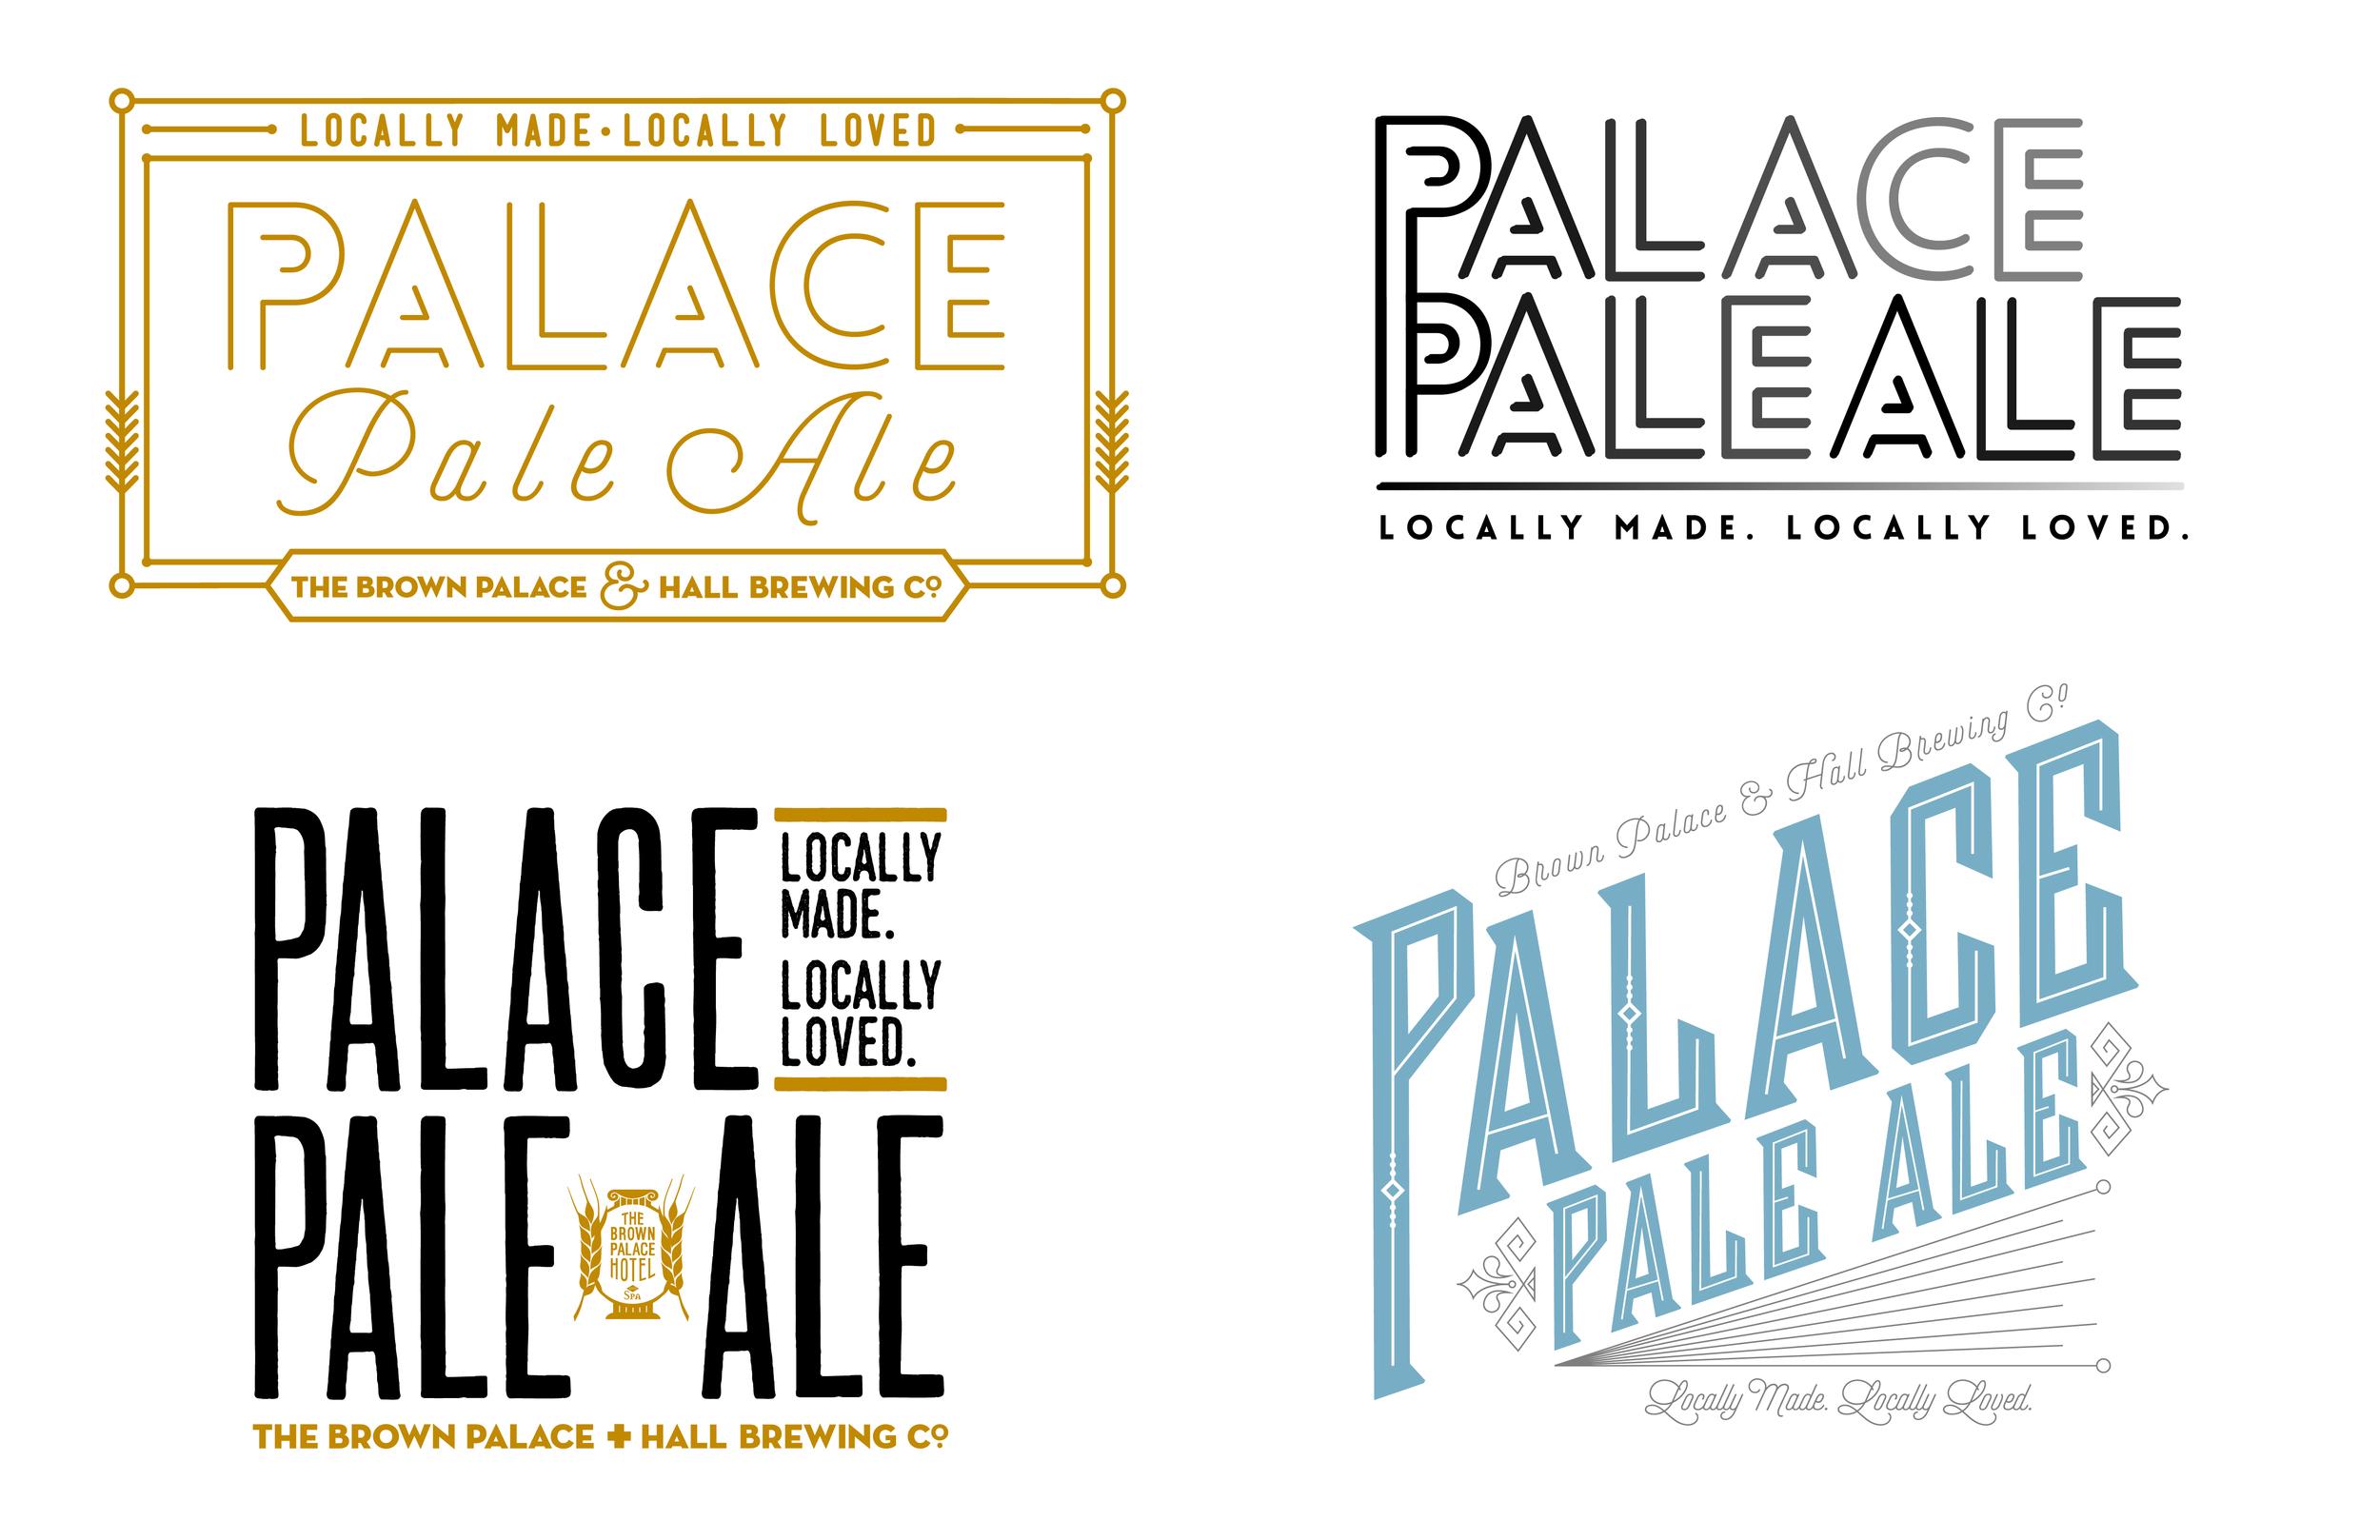 9227_BP_PalacePaleAle_L1_Exploration_All-05.jpg